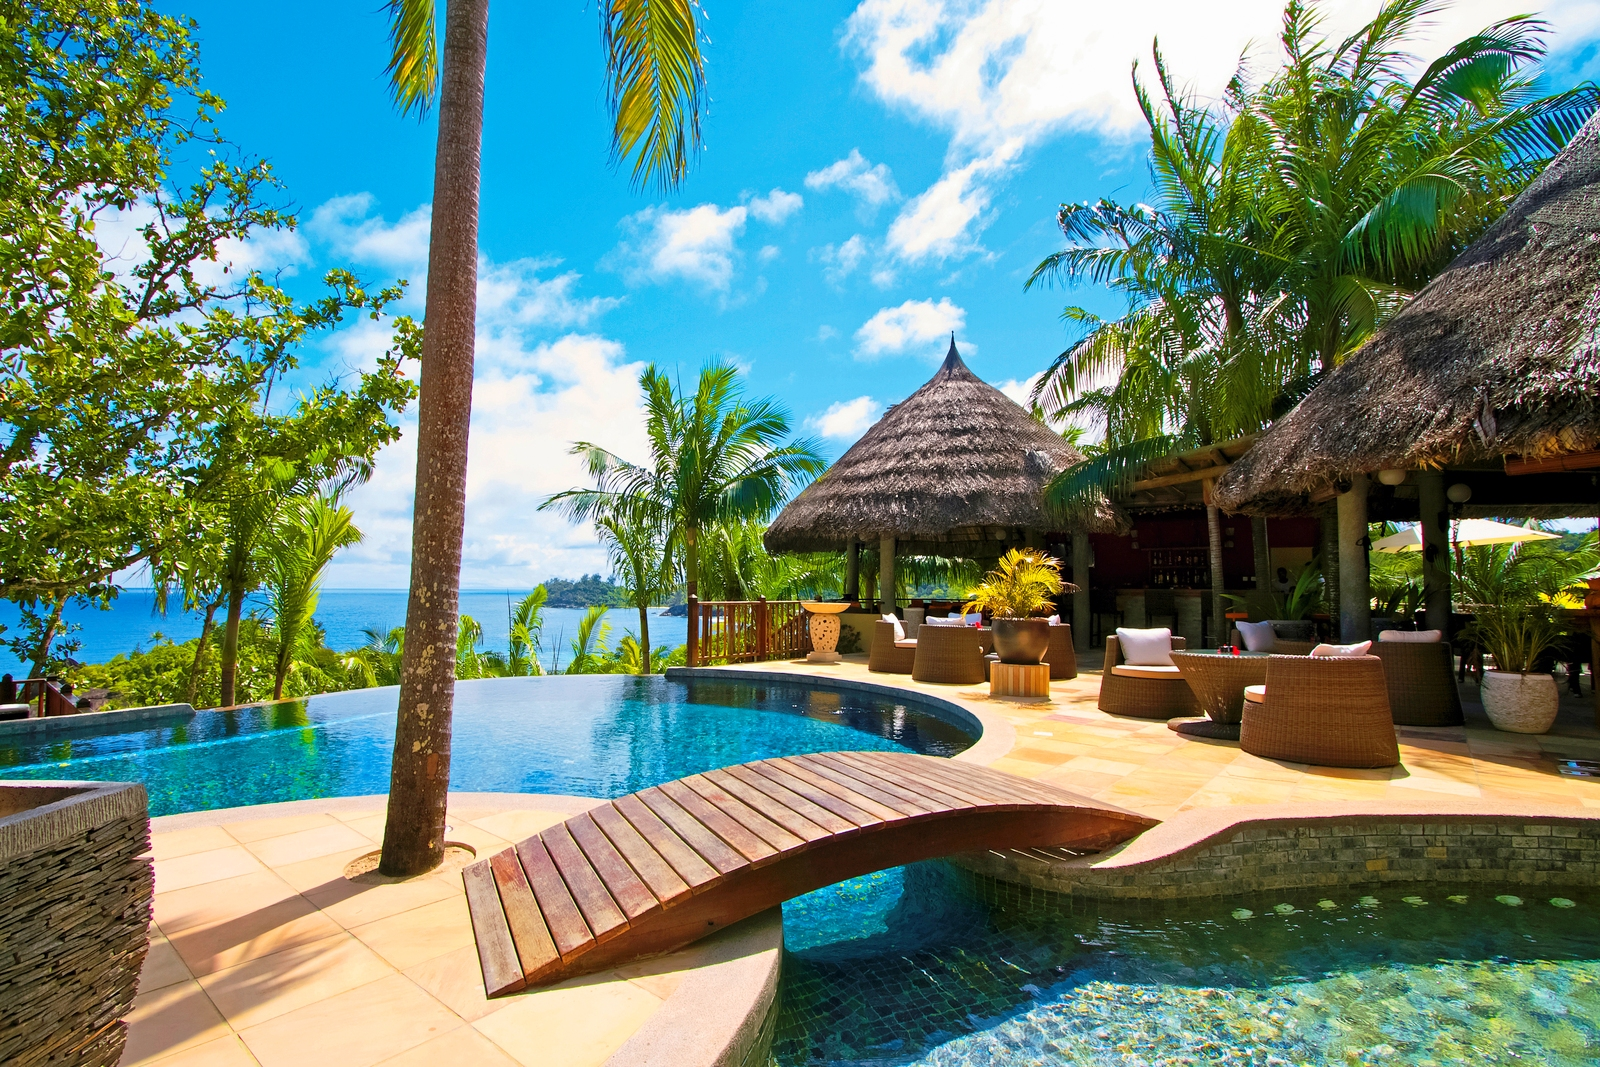 dubai seychellen erlebnisreise diko reisen kunst events. Black Bedroom Furniture Sets. Home Design Ideas